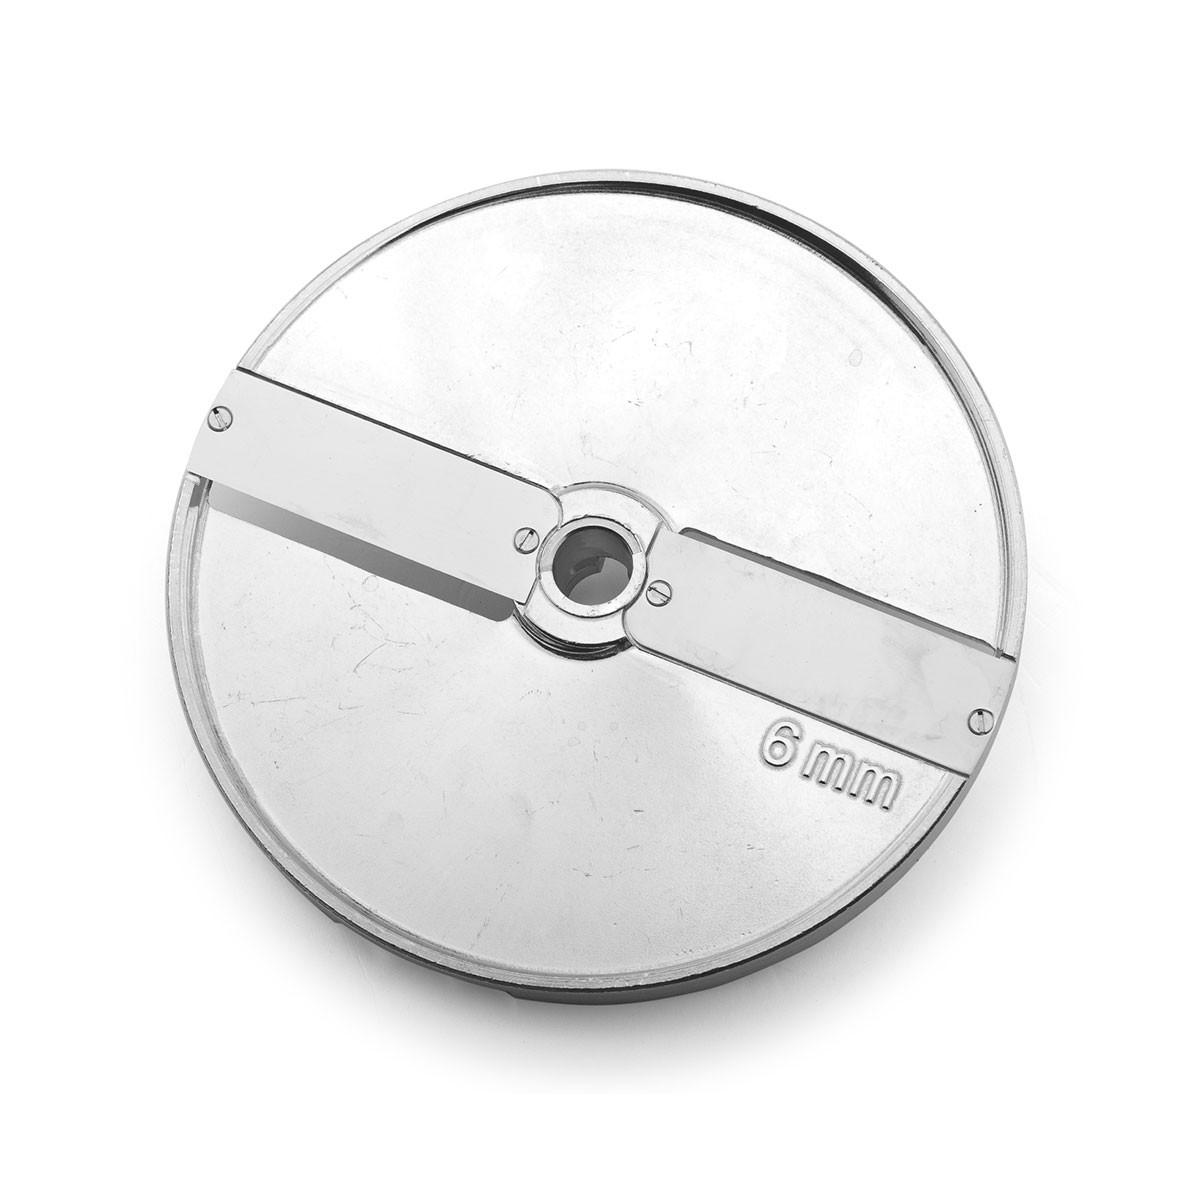 Schneidescheibe AS006 aus Aluminium - 6 mm Saro